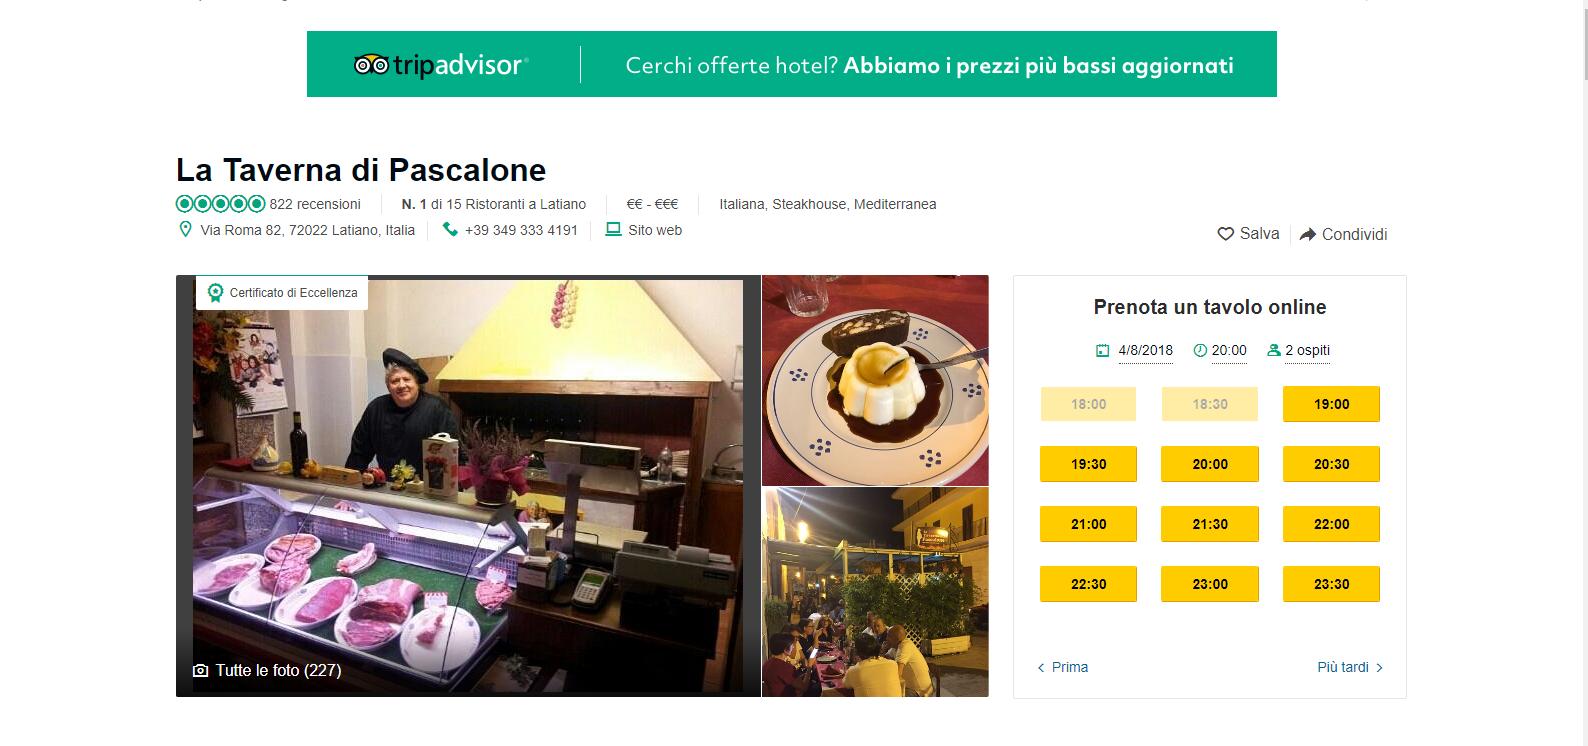 https://www.tripadvisor.it/Restaurant_Review-g2508533-d2571194-Reviews-La_Taverna_di_Pascalone-Latiano_Province_of_Brindisi_Puglia.html#photos;aggregationId=101&albumid=101&filter=7&ff=134557406